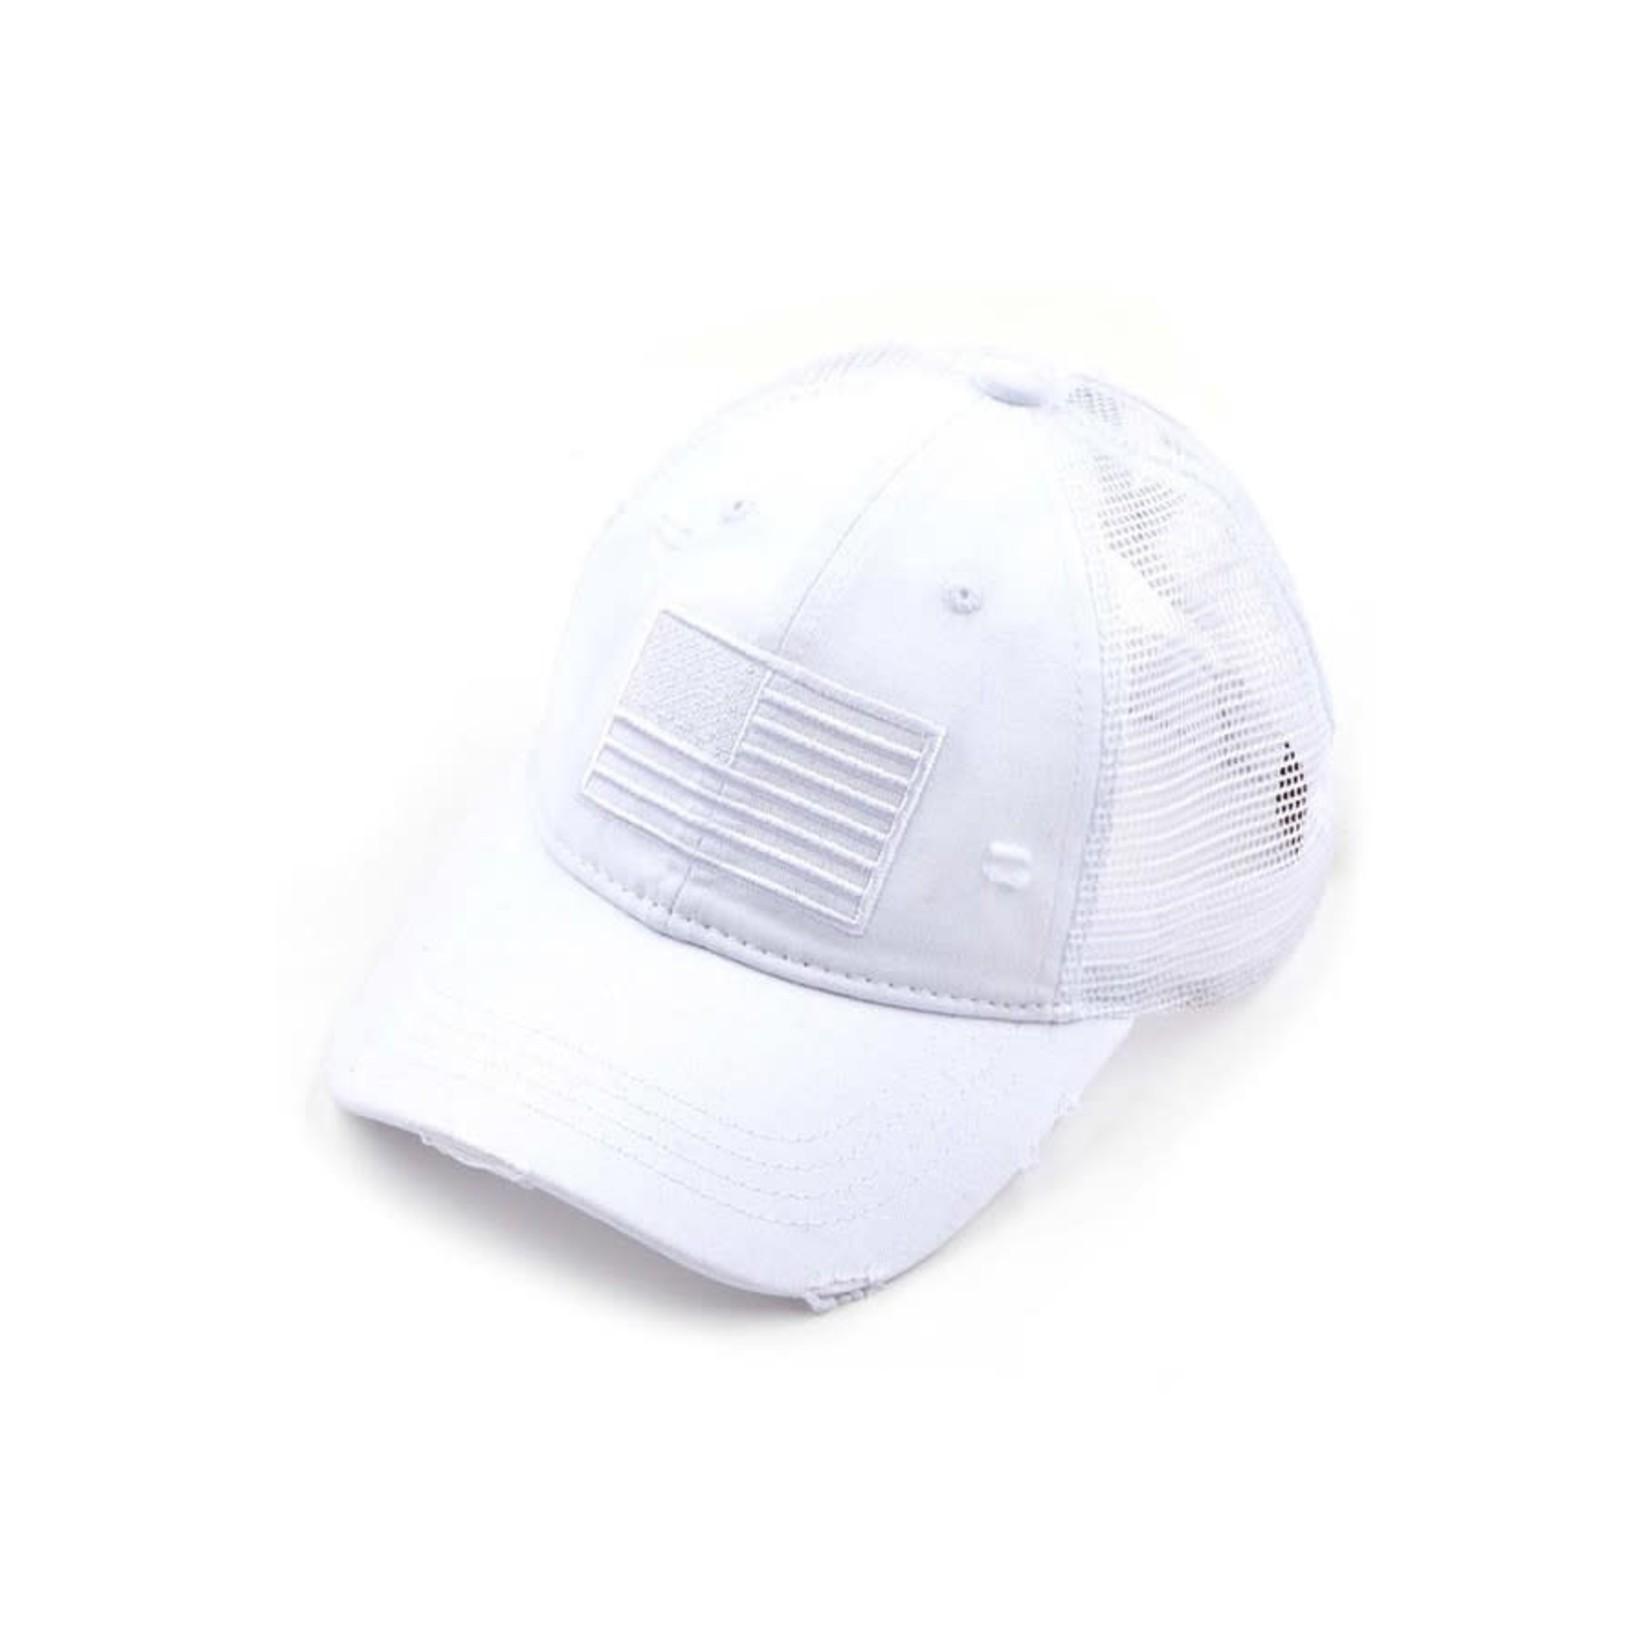 Hanna Hoisery Accessories: WhiteU.S.A. Ponytail Trucker Hat